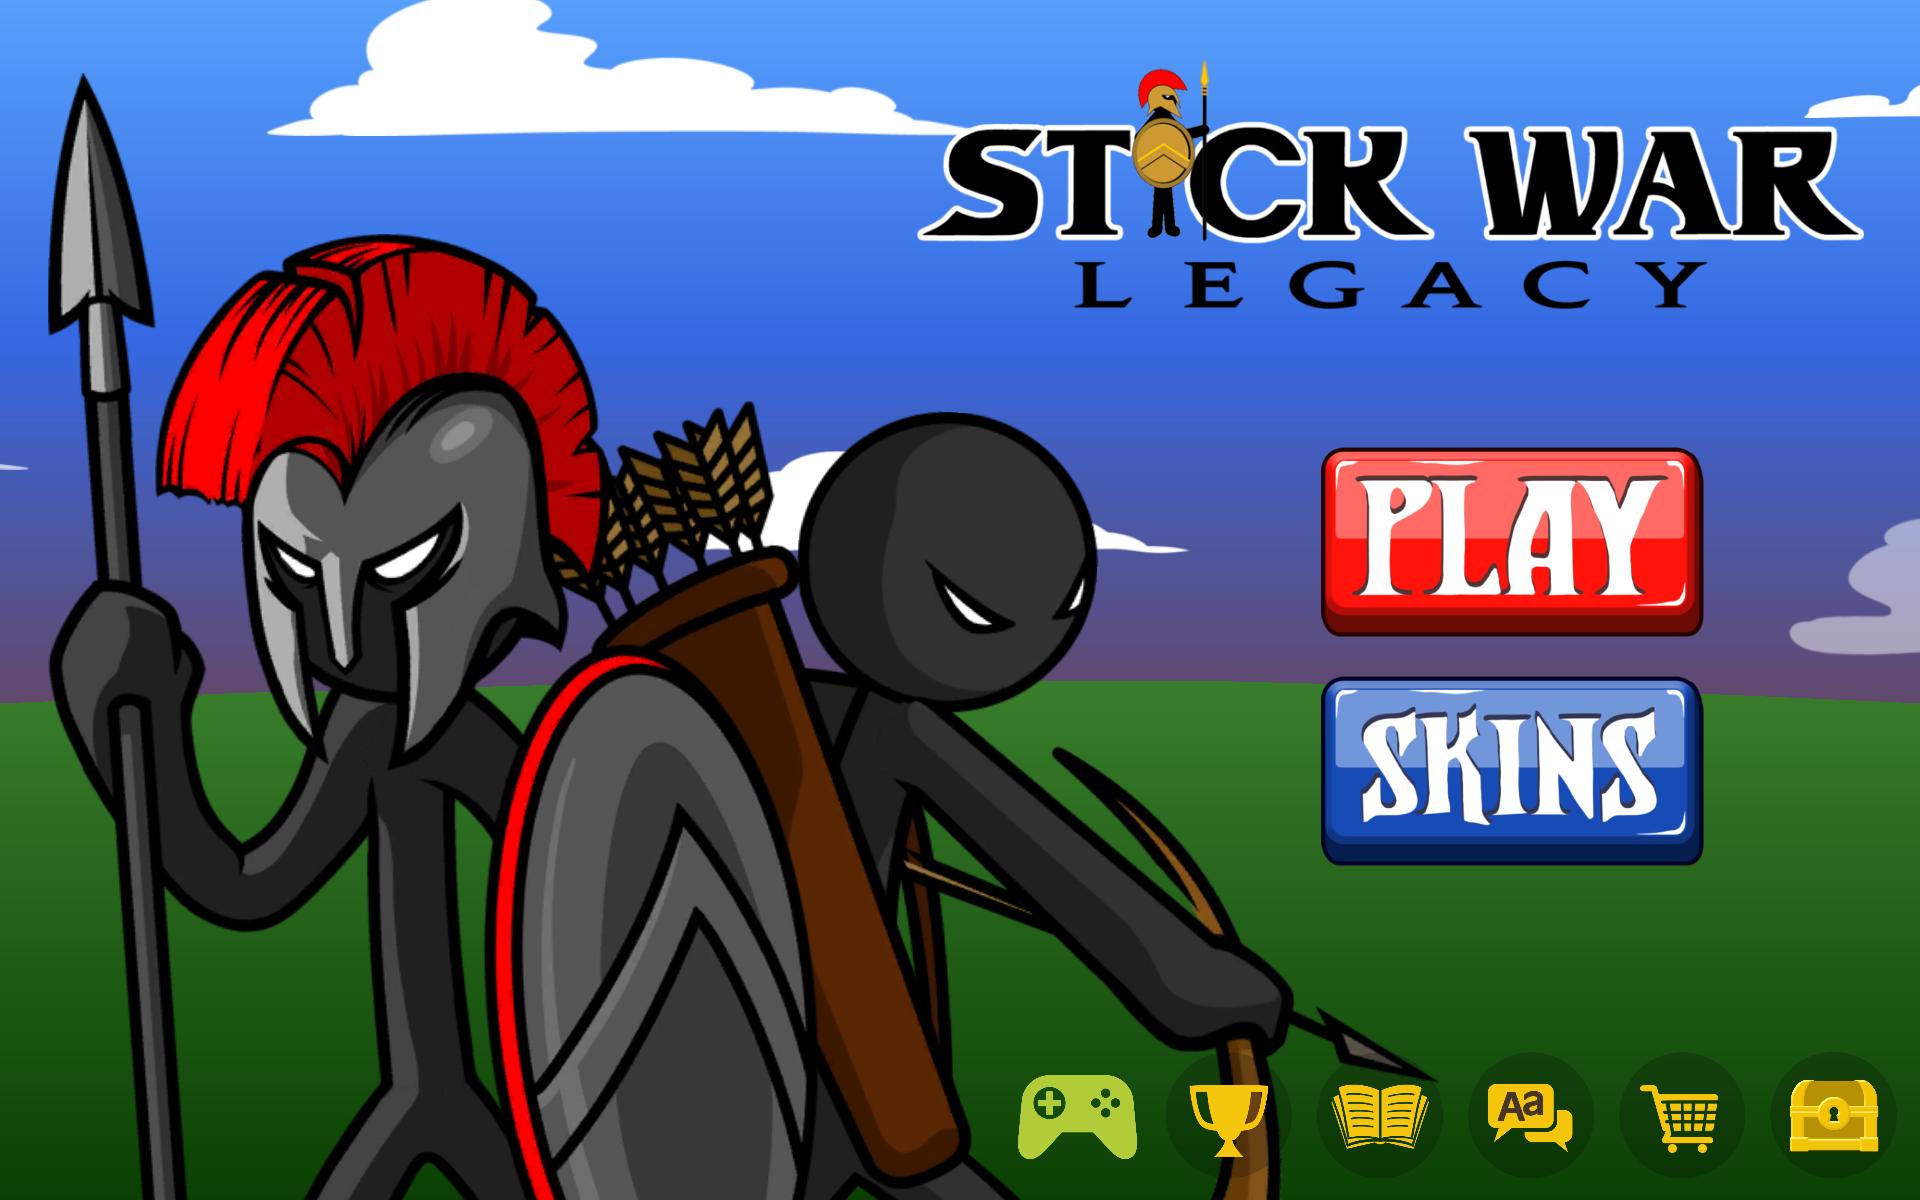 Play the game stick war 2 free slots machines fun online